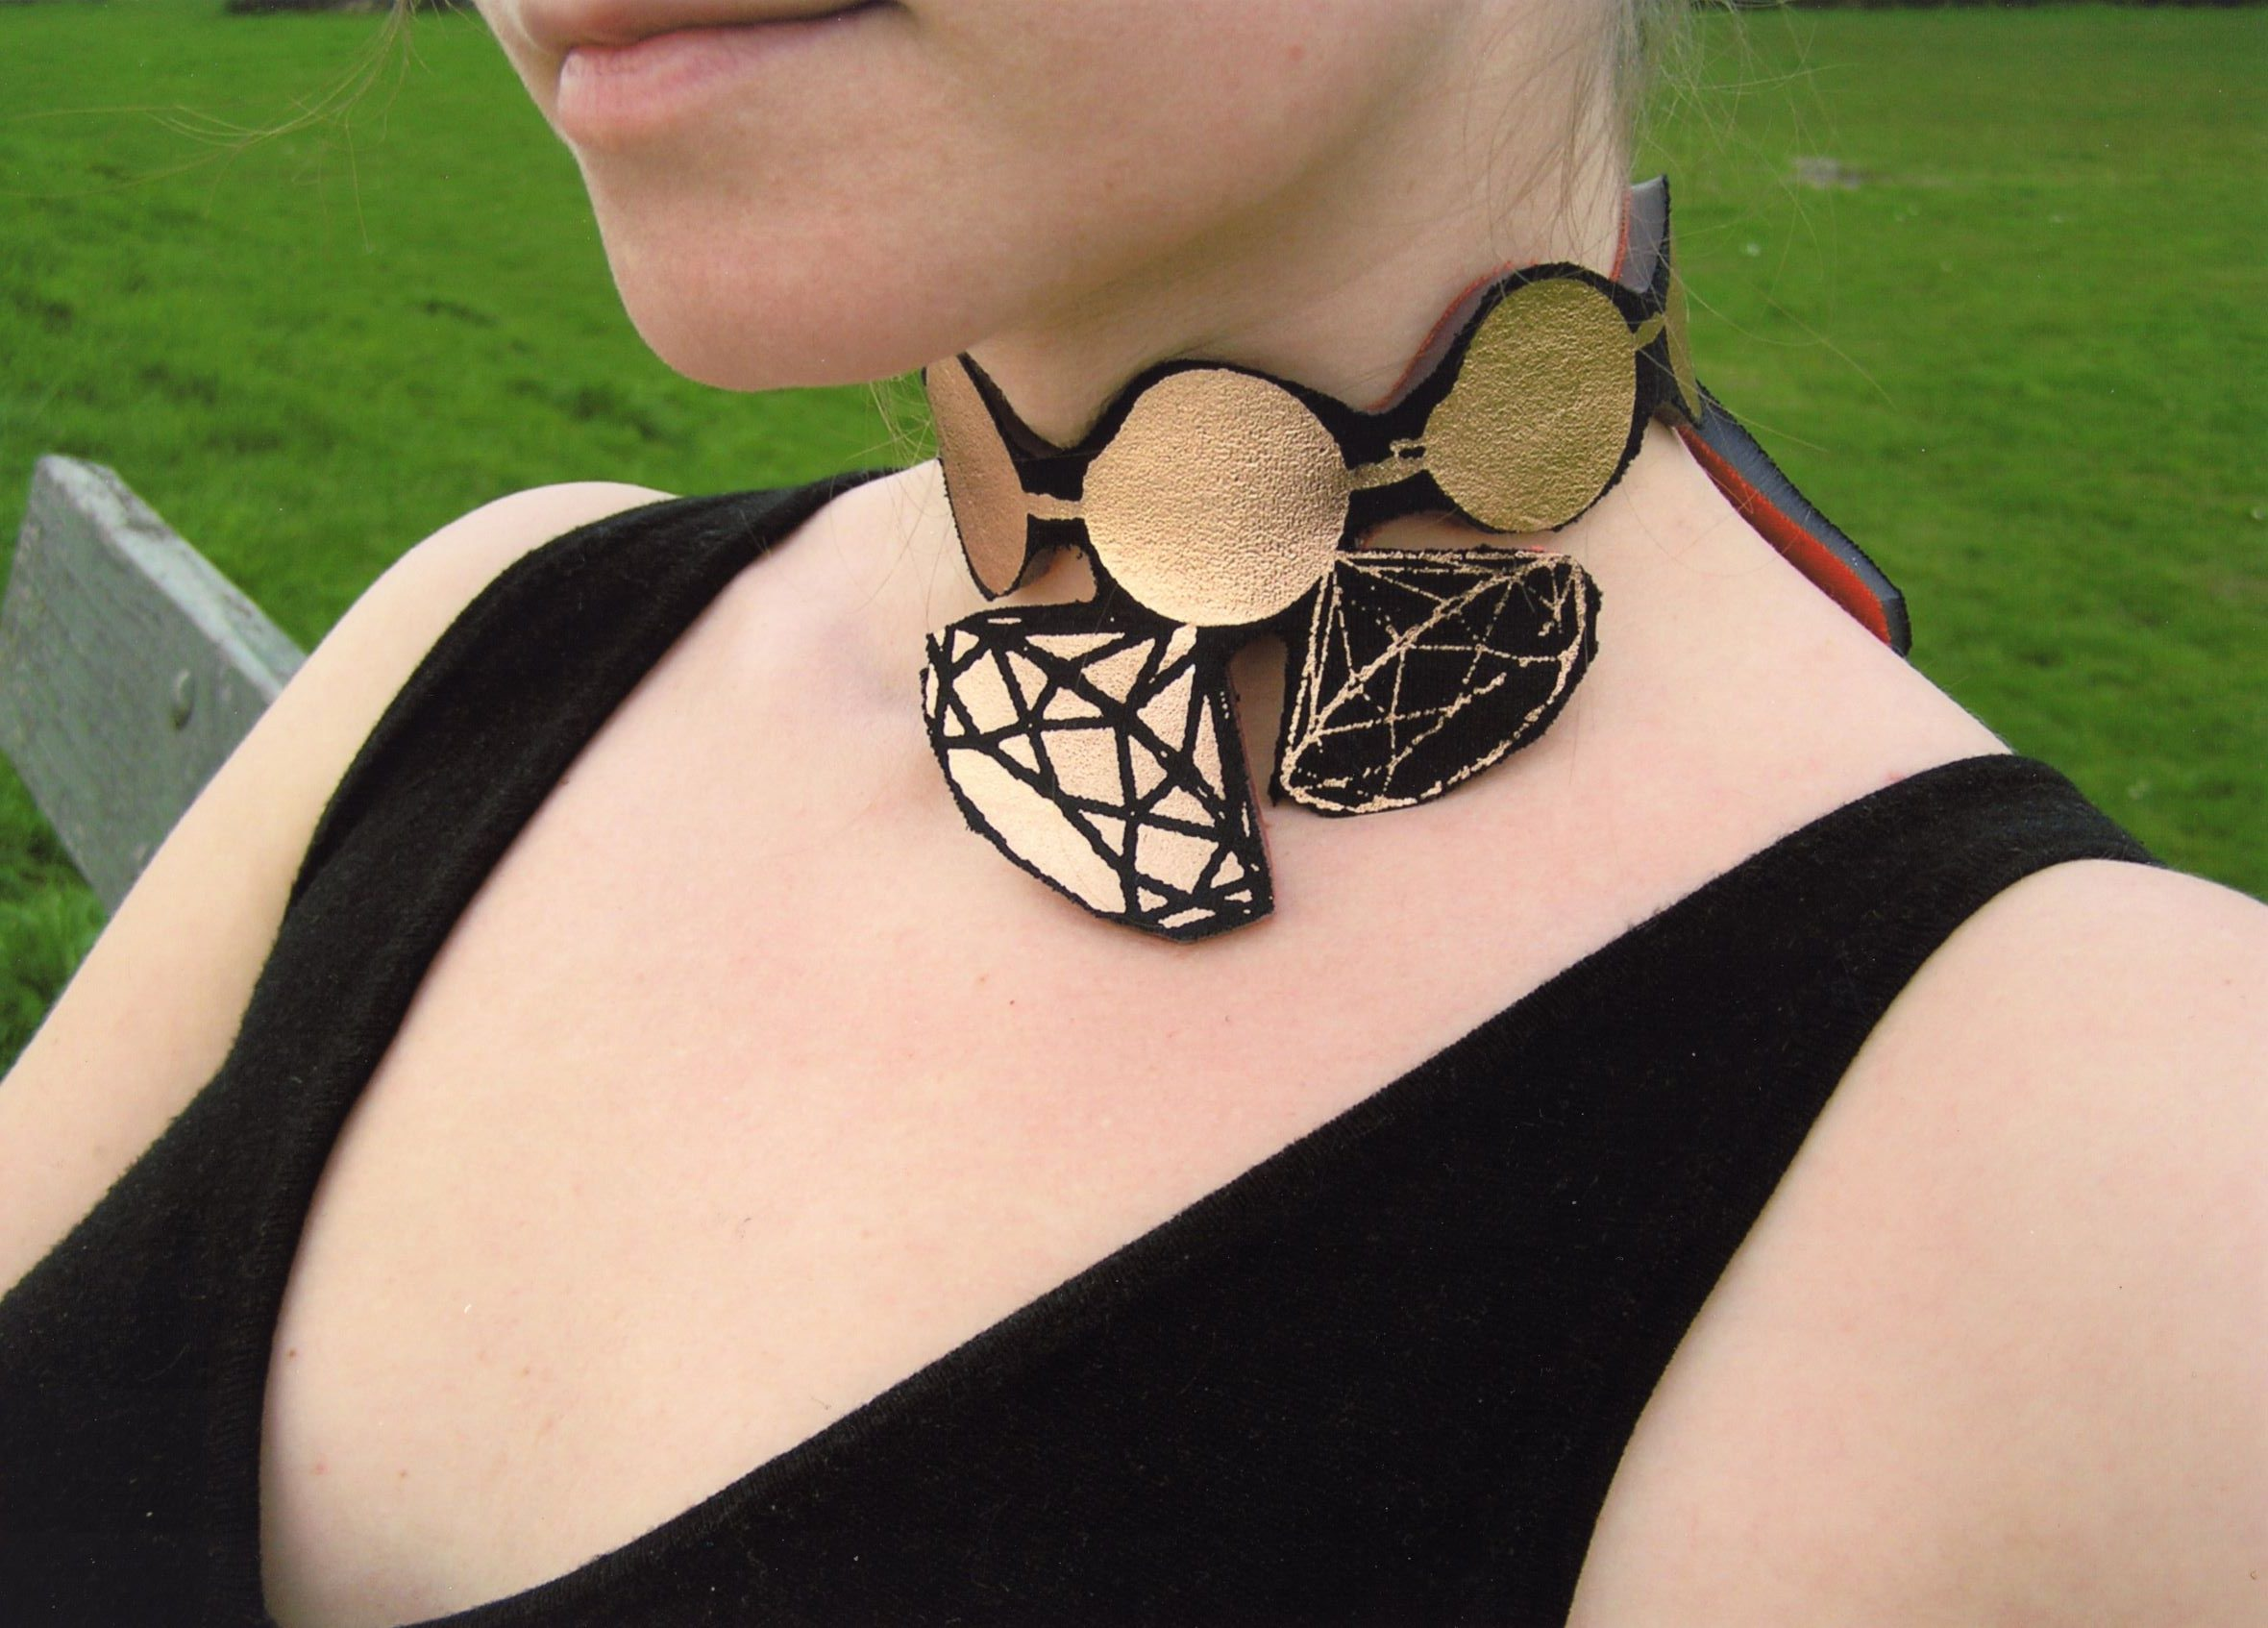 Uli Rapp, Pearls and Diamonds, halssieraad, 2006, kunststof, textiel, zeefdruk